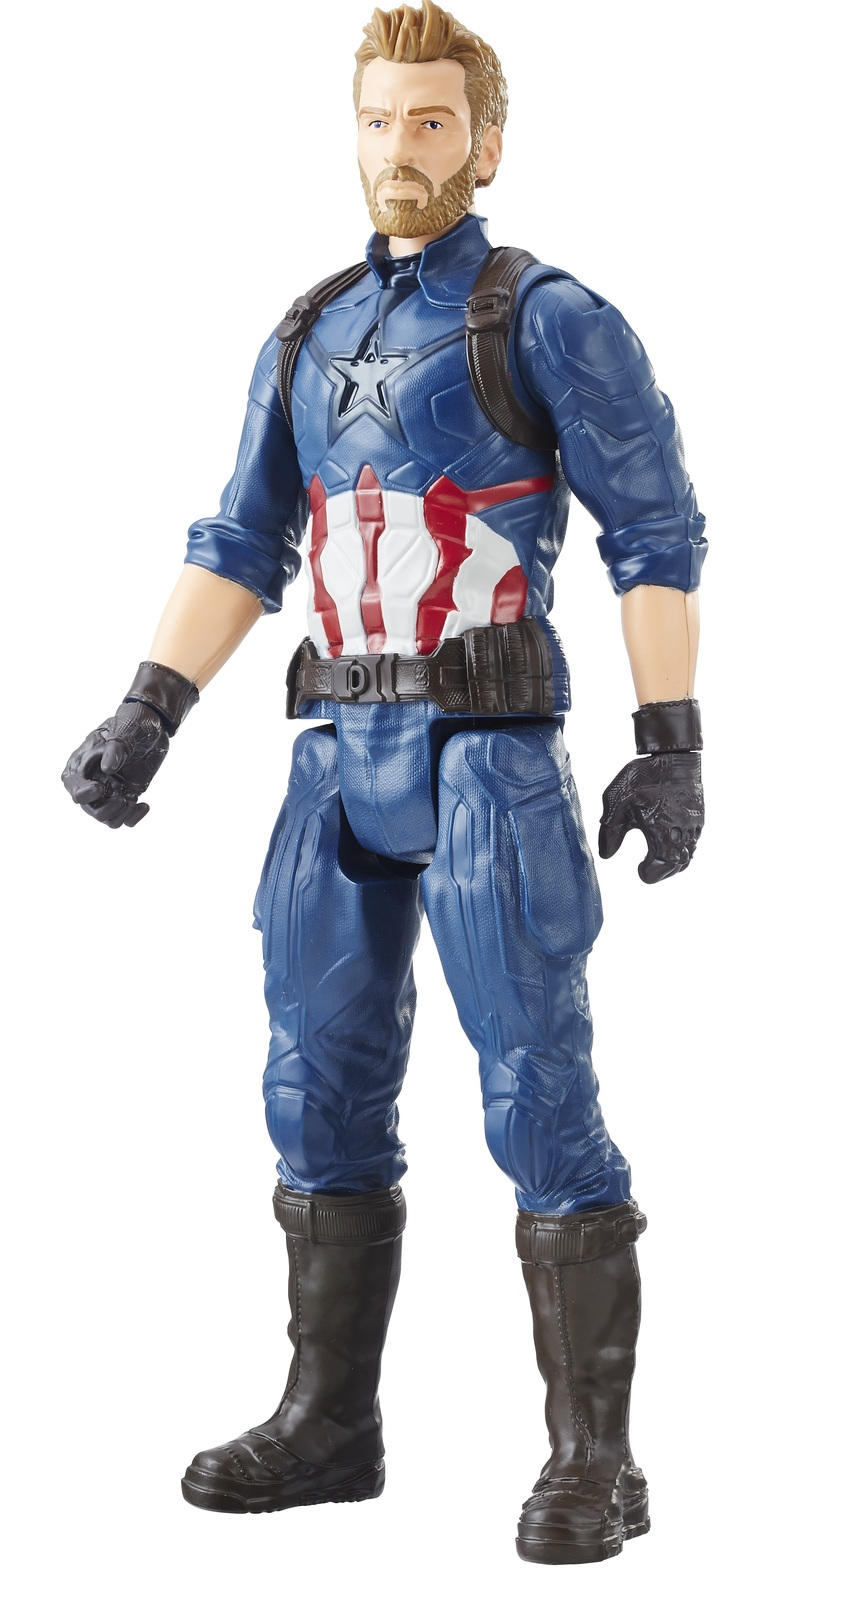 "Avengers Infinity War: Captain America - 12"" Titan Hero Figure image"